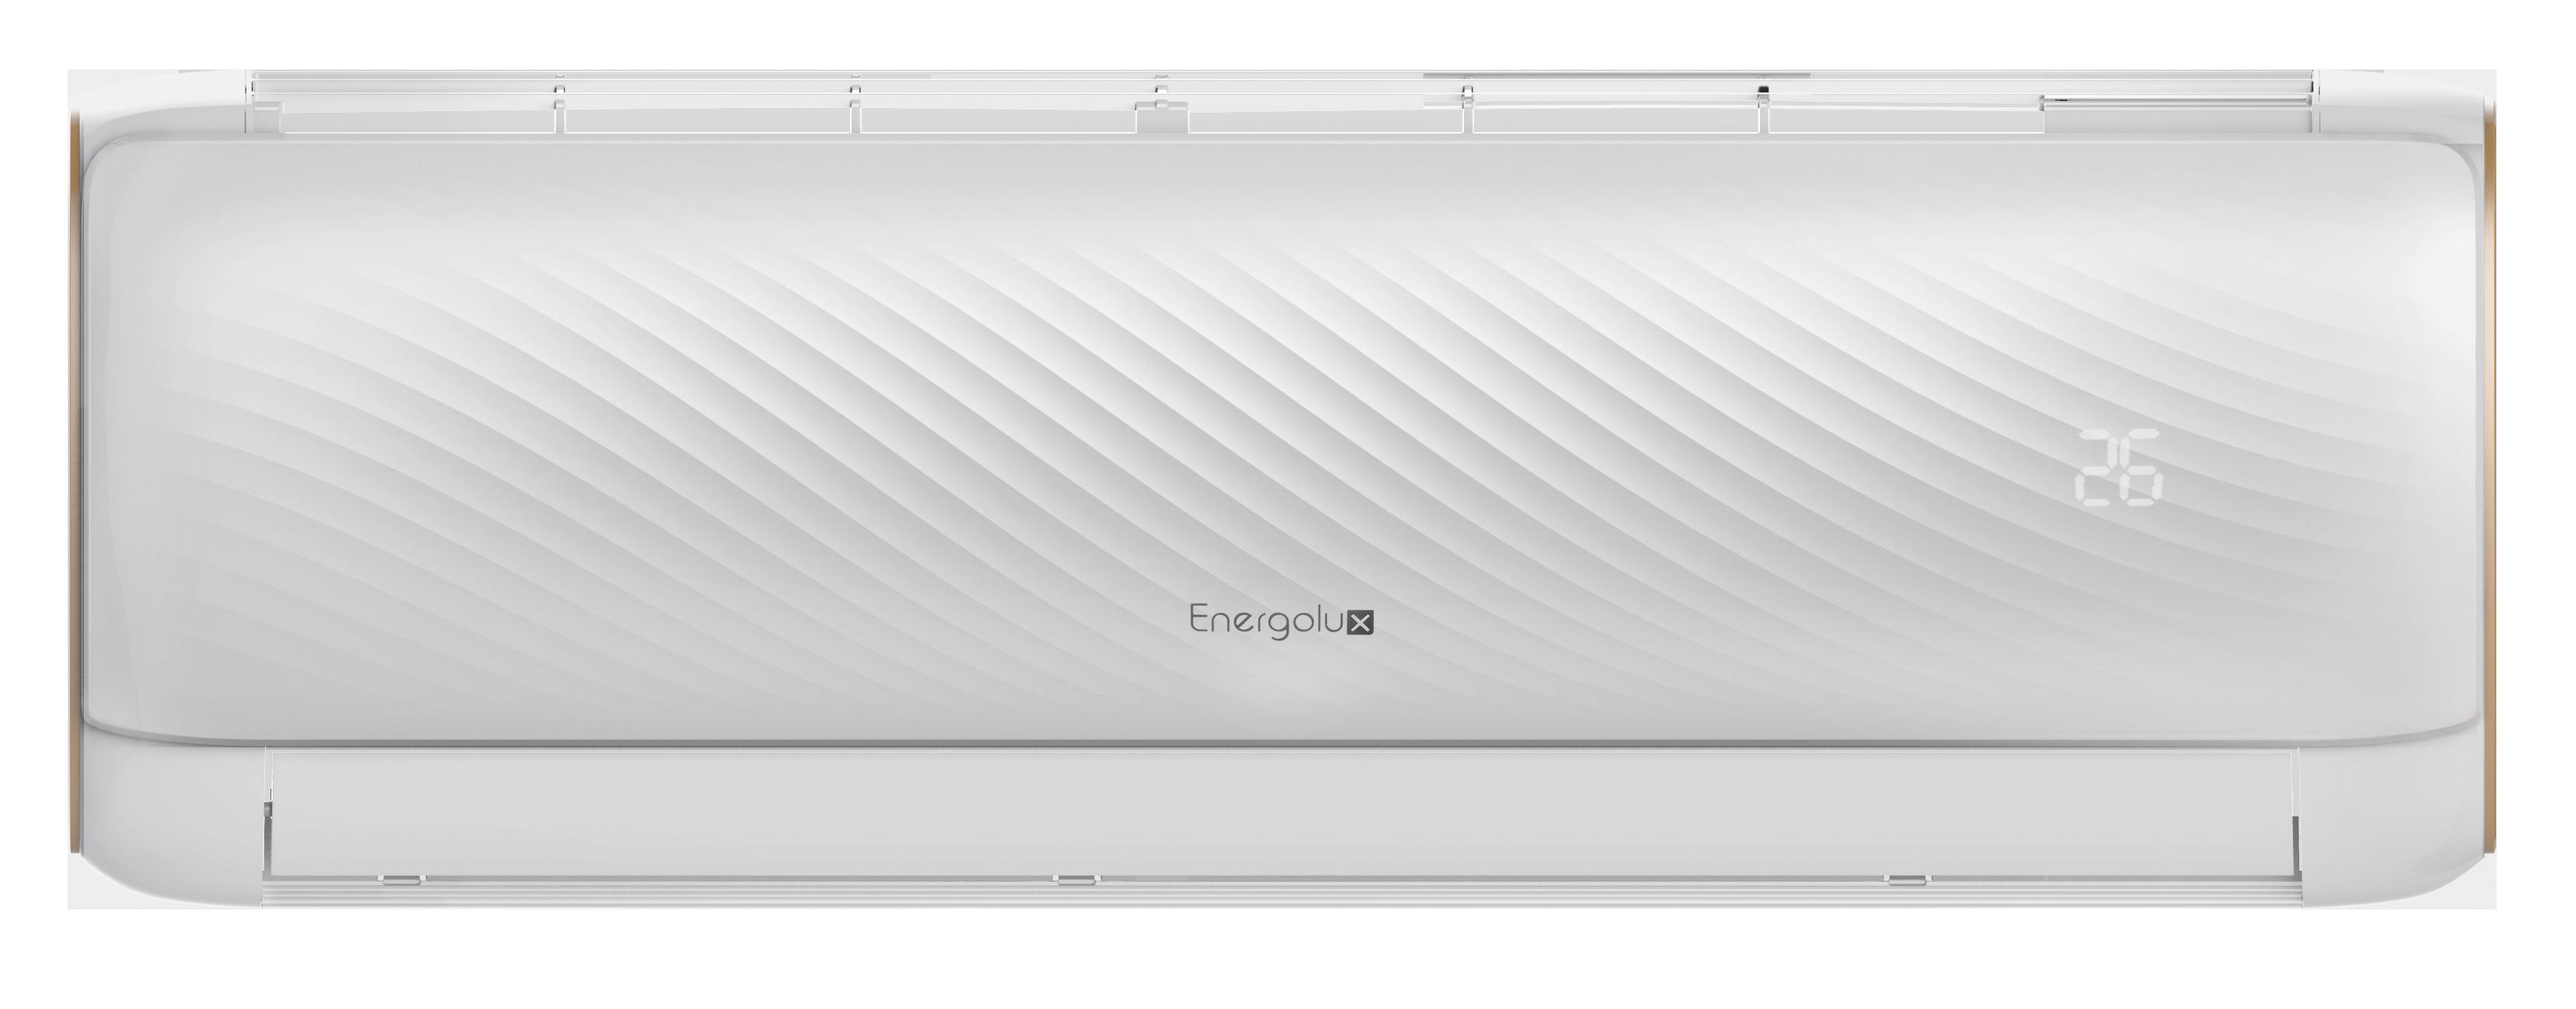 Energolux DAVOS SAS30D1-A/SAU30D1-A-WS